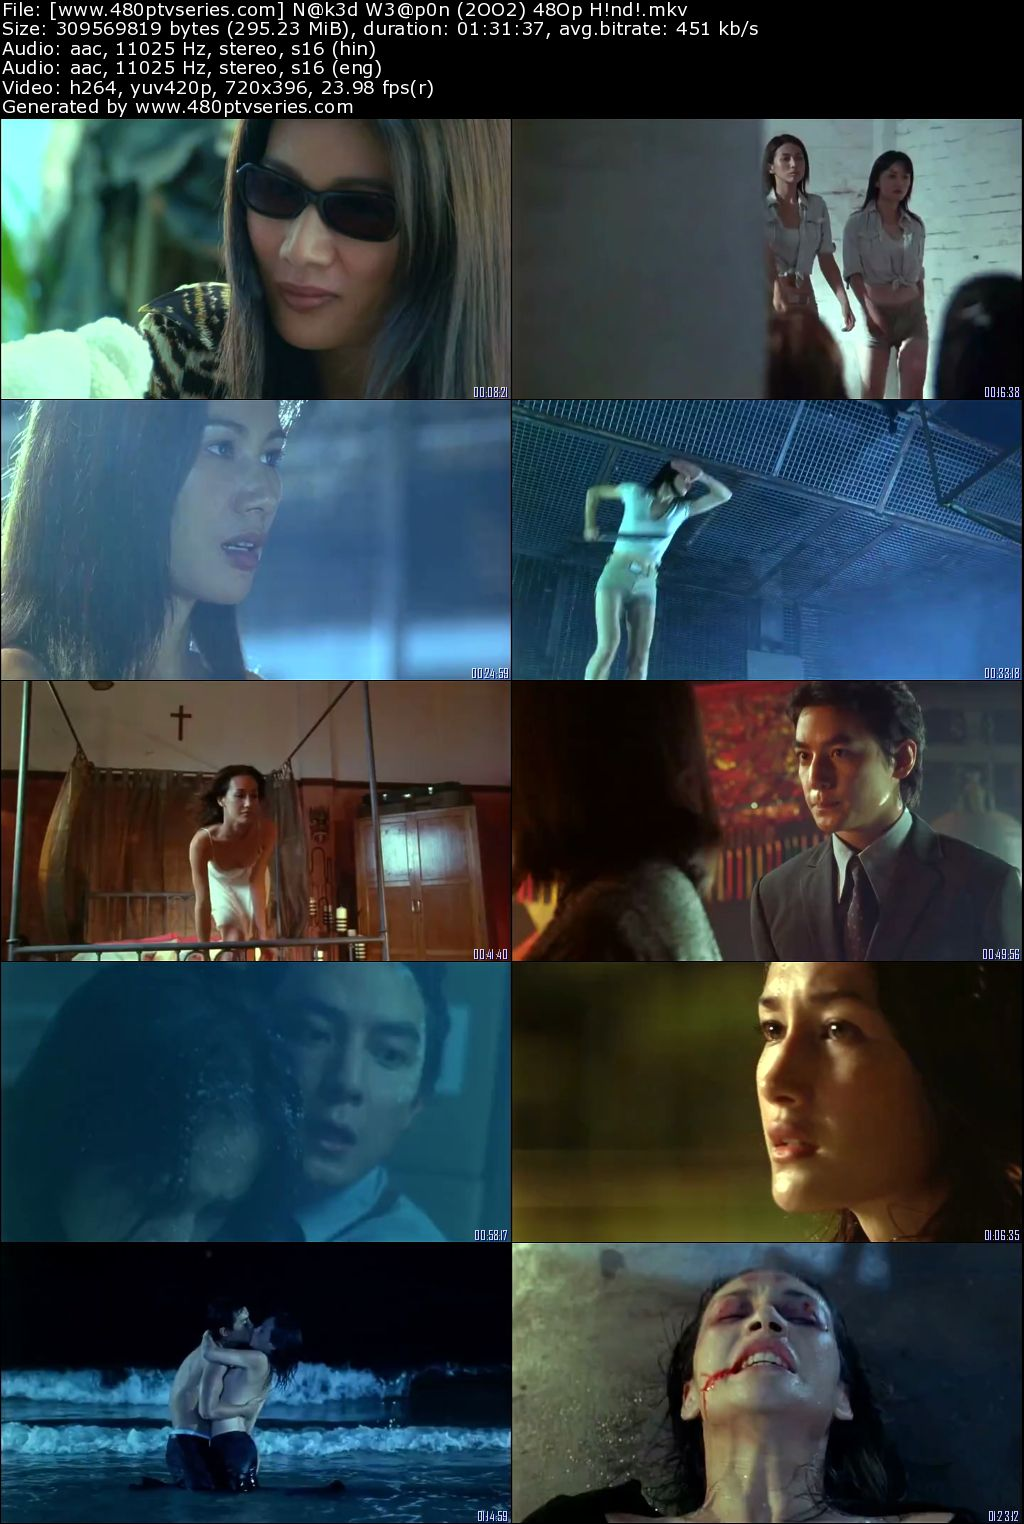 Naked Weapon (2002) 300MB Full Hindi Dual Audio Movie Download 480p BRRip Free Watch Online Full Movie Download Worldfree4u 9xmovies